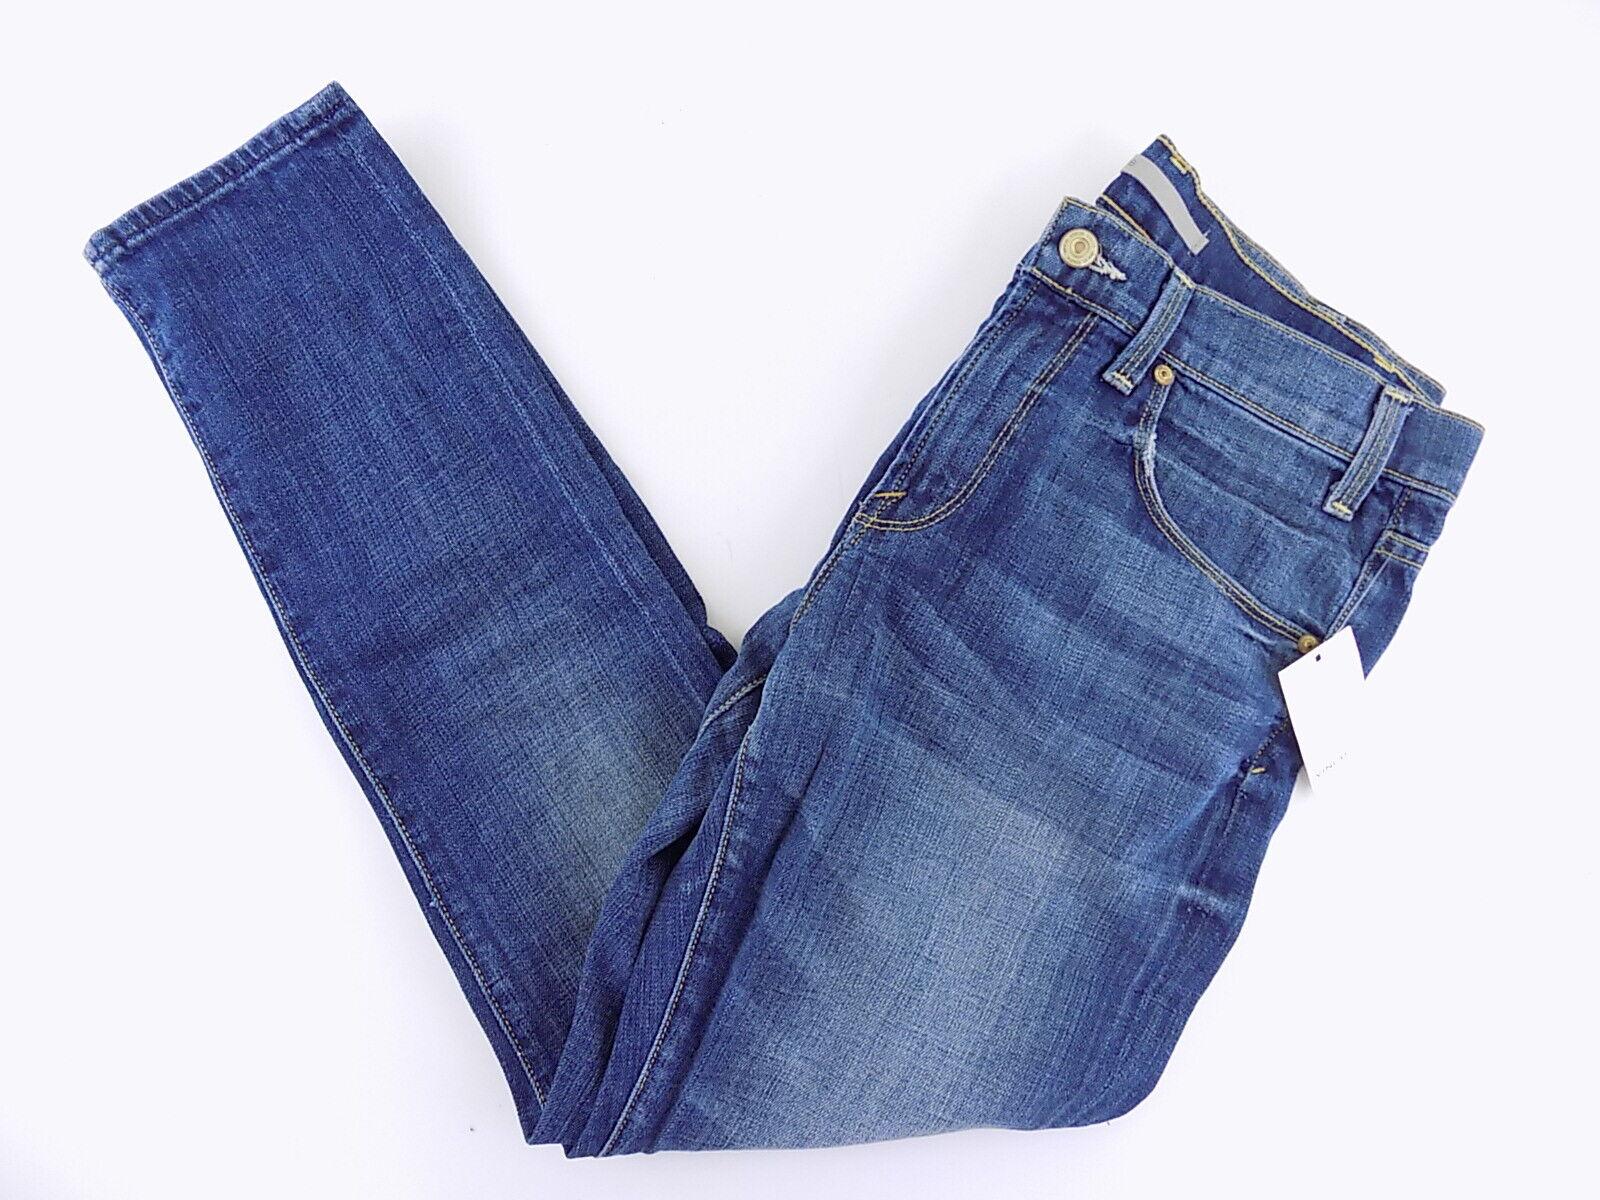 VINCE  WOMEN SIZE 27 blueE SLIM DESIGNER JEANS M18